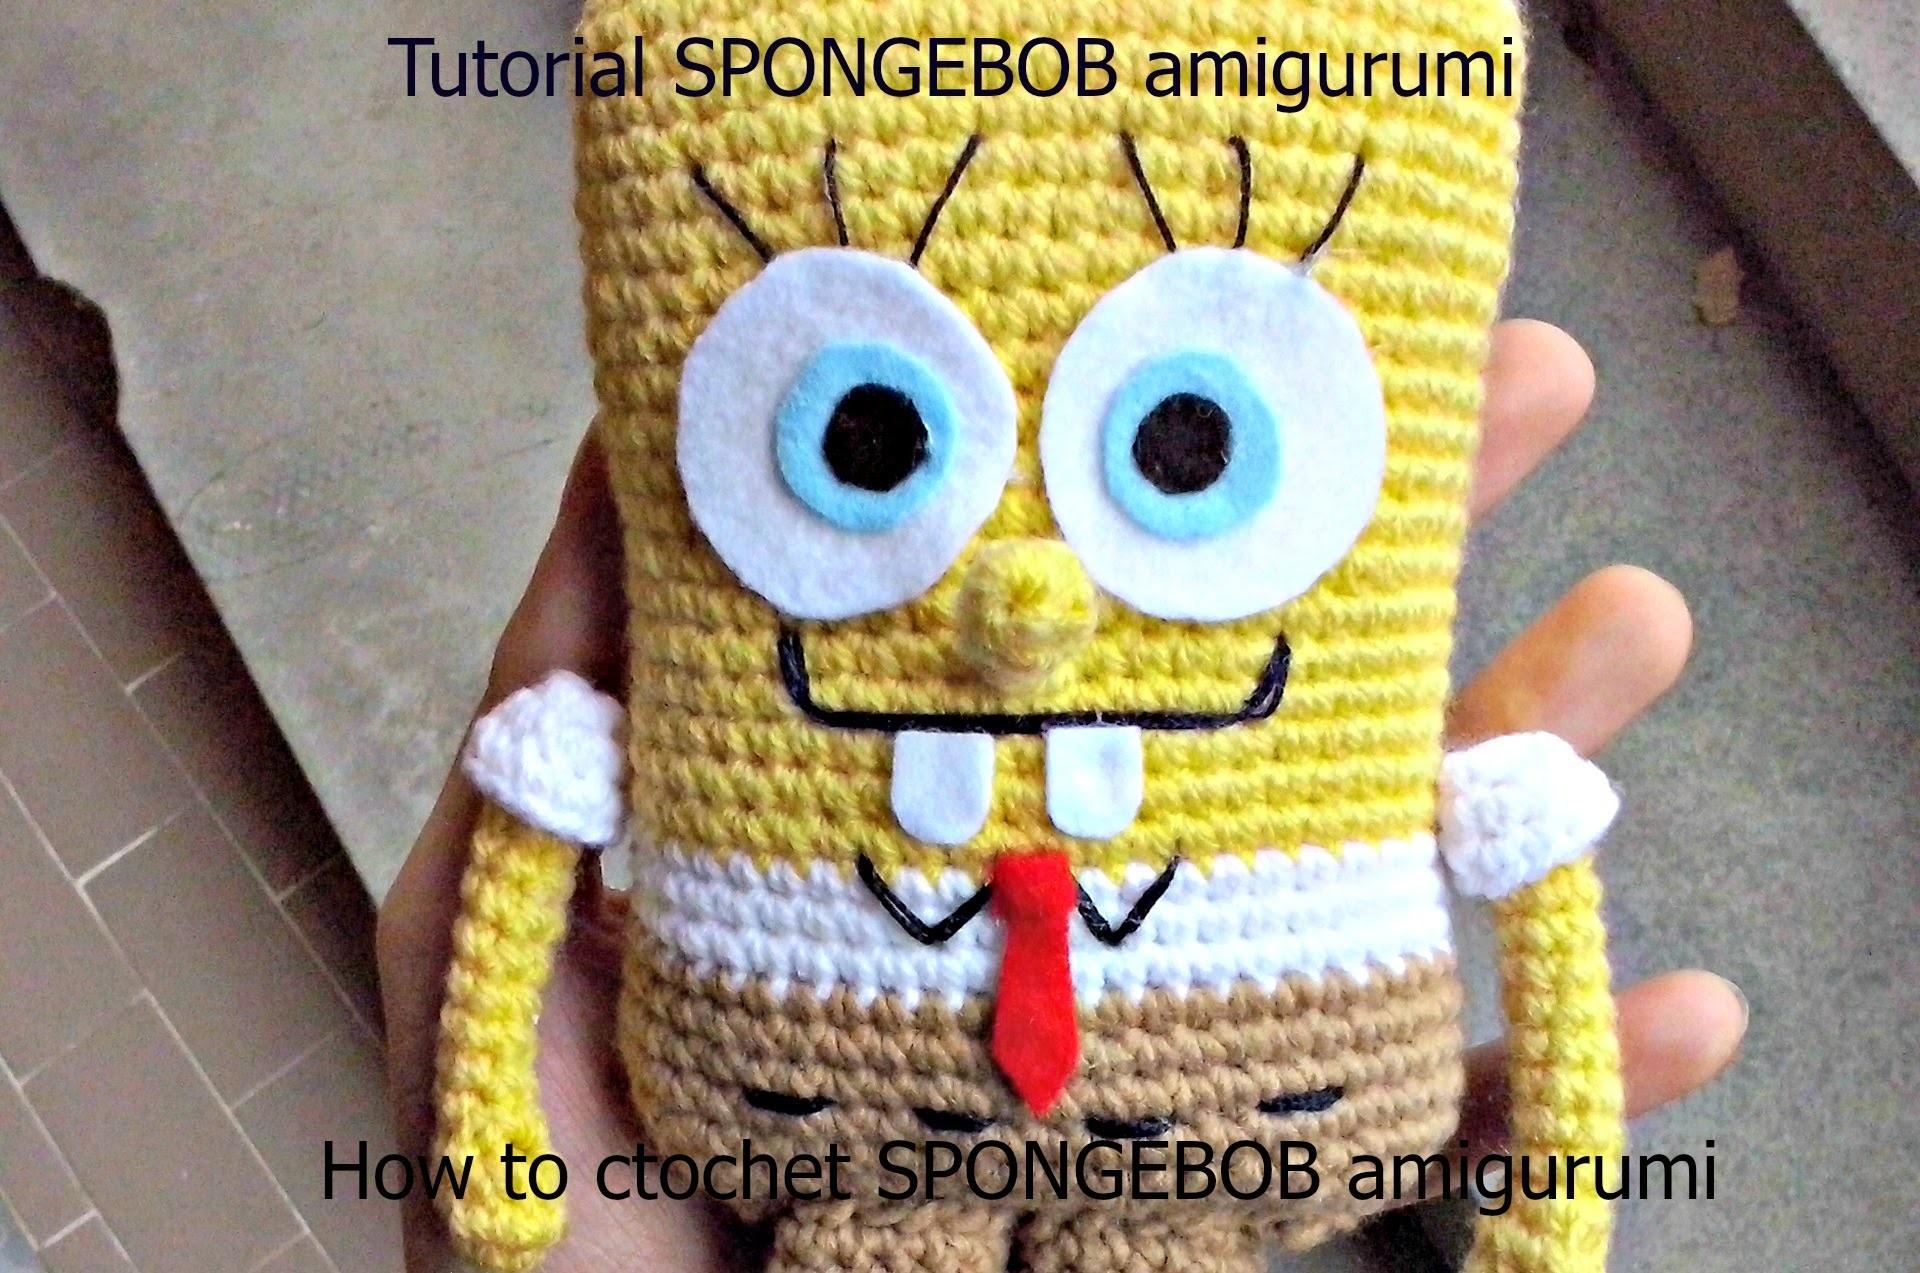 Tutorial SPONGEBOB amigurumi | HOW TO CROCHET SPONGEBOB AMIGURUMI - Part 1 - SubENG